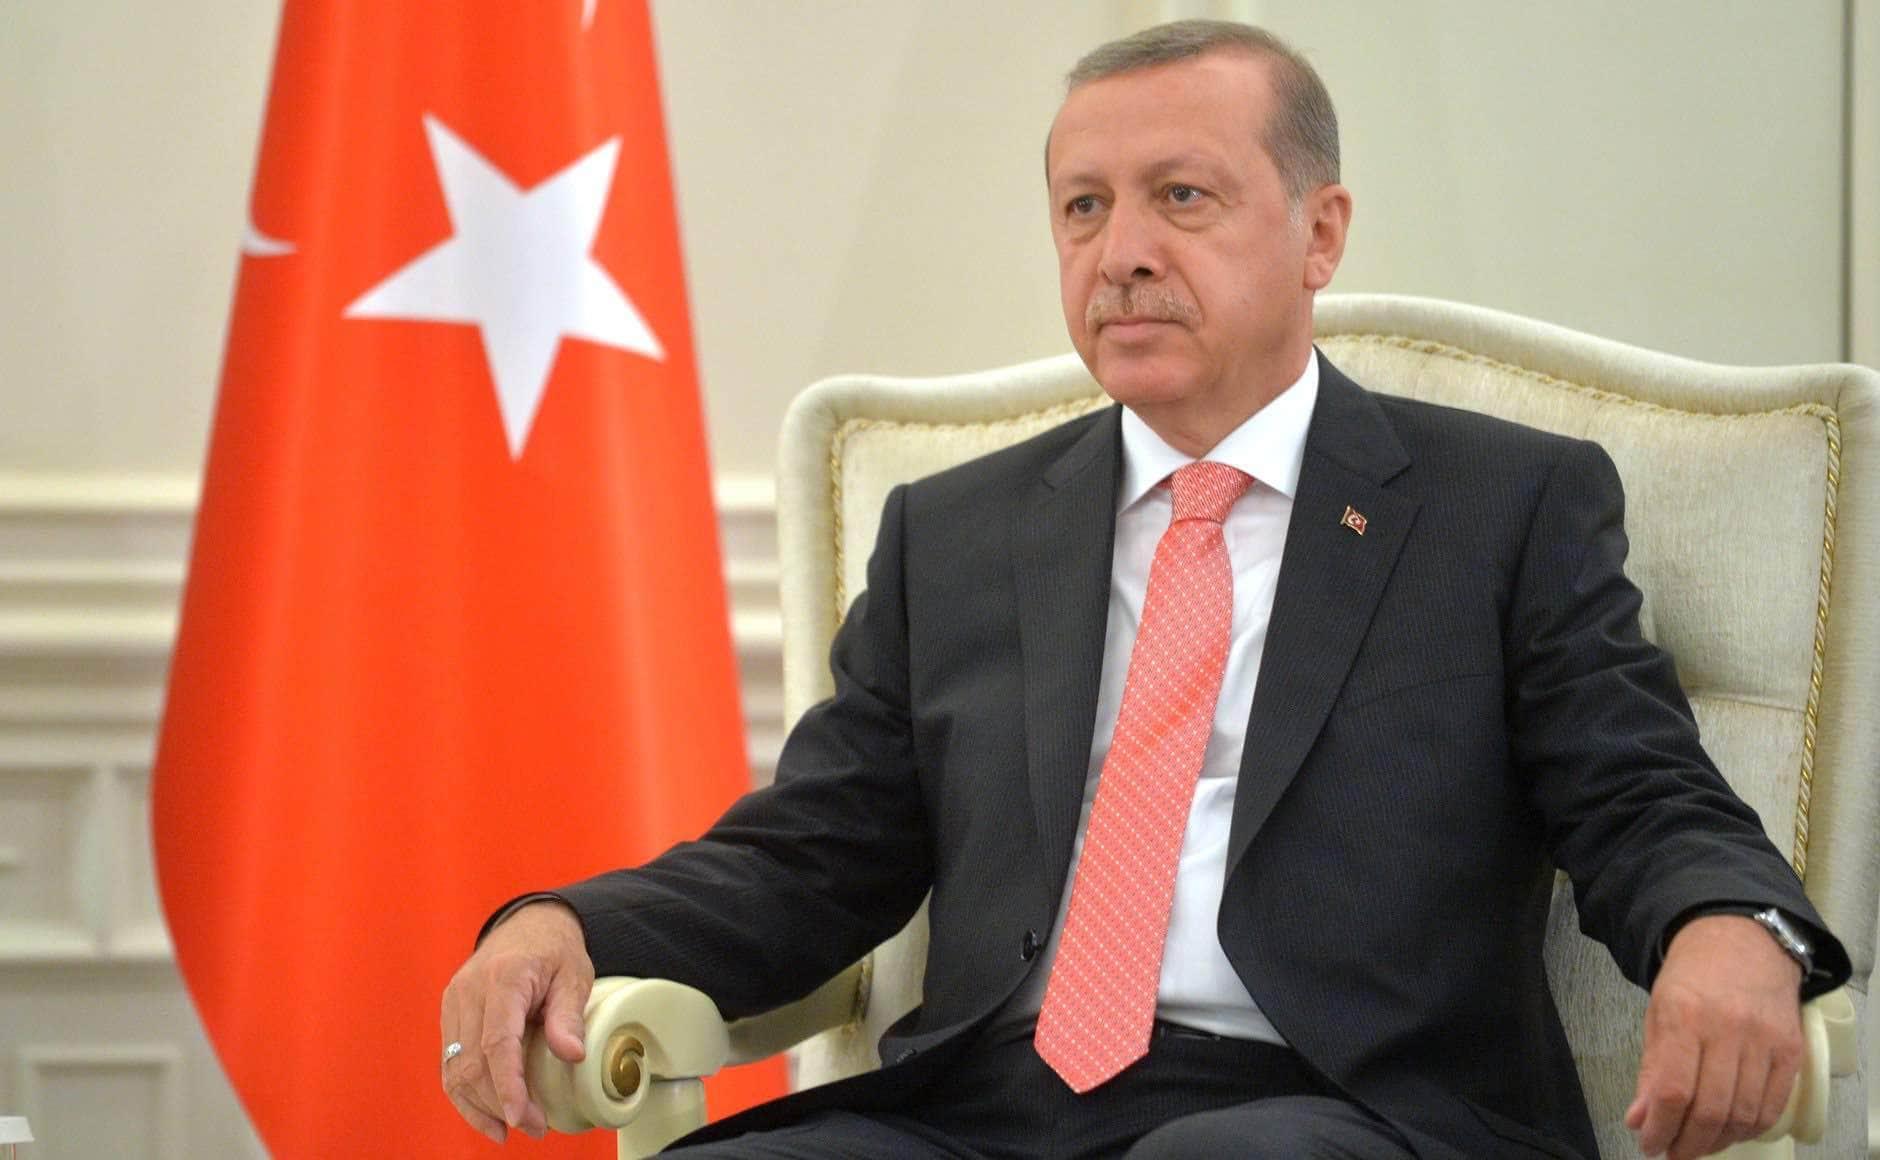 Besuch im Kreml: Erdogan im Juni 2015 / (c) kremlin.ru/events/president/news/49702